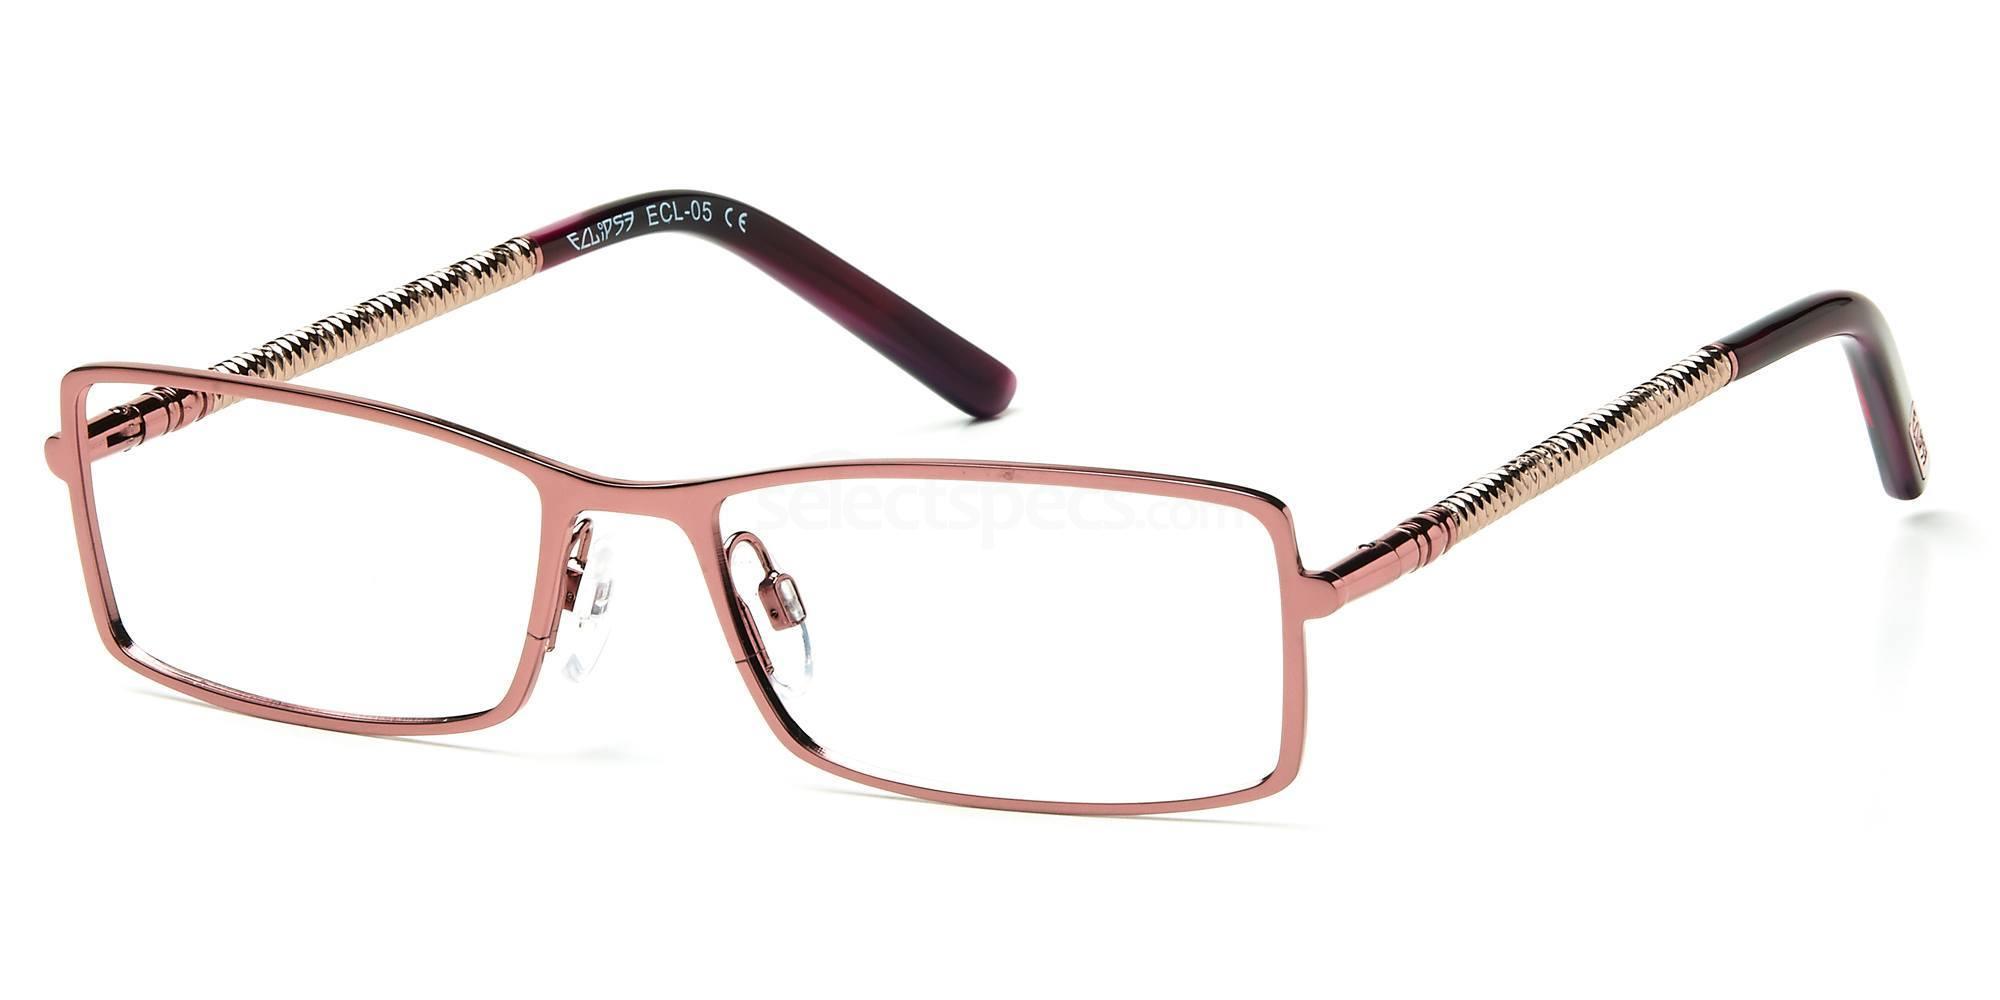 C1 ECL05 Glasses, Eclipse